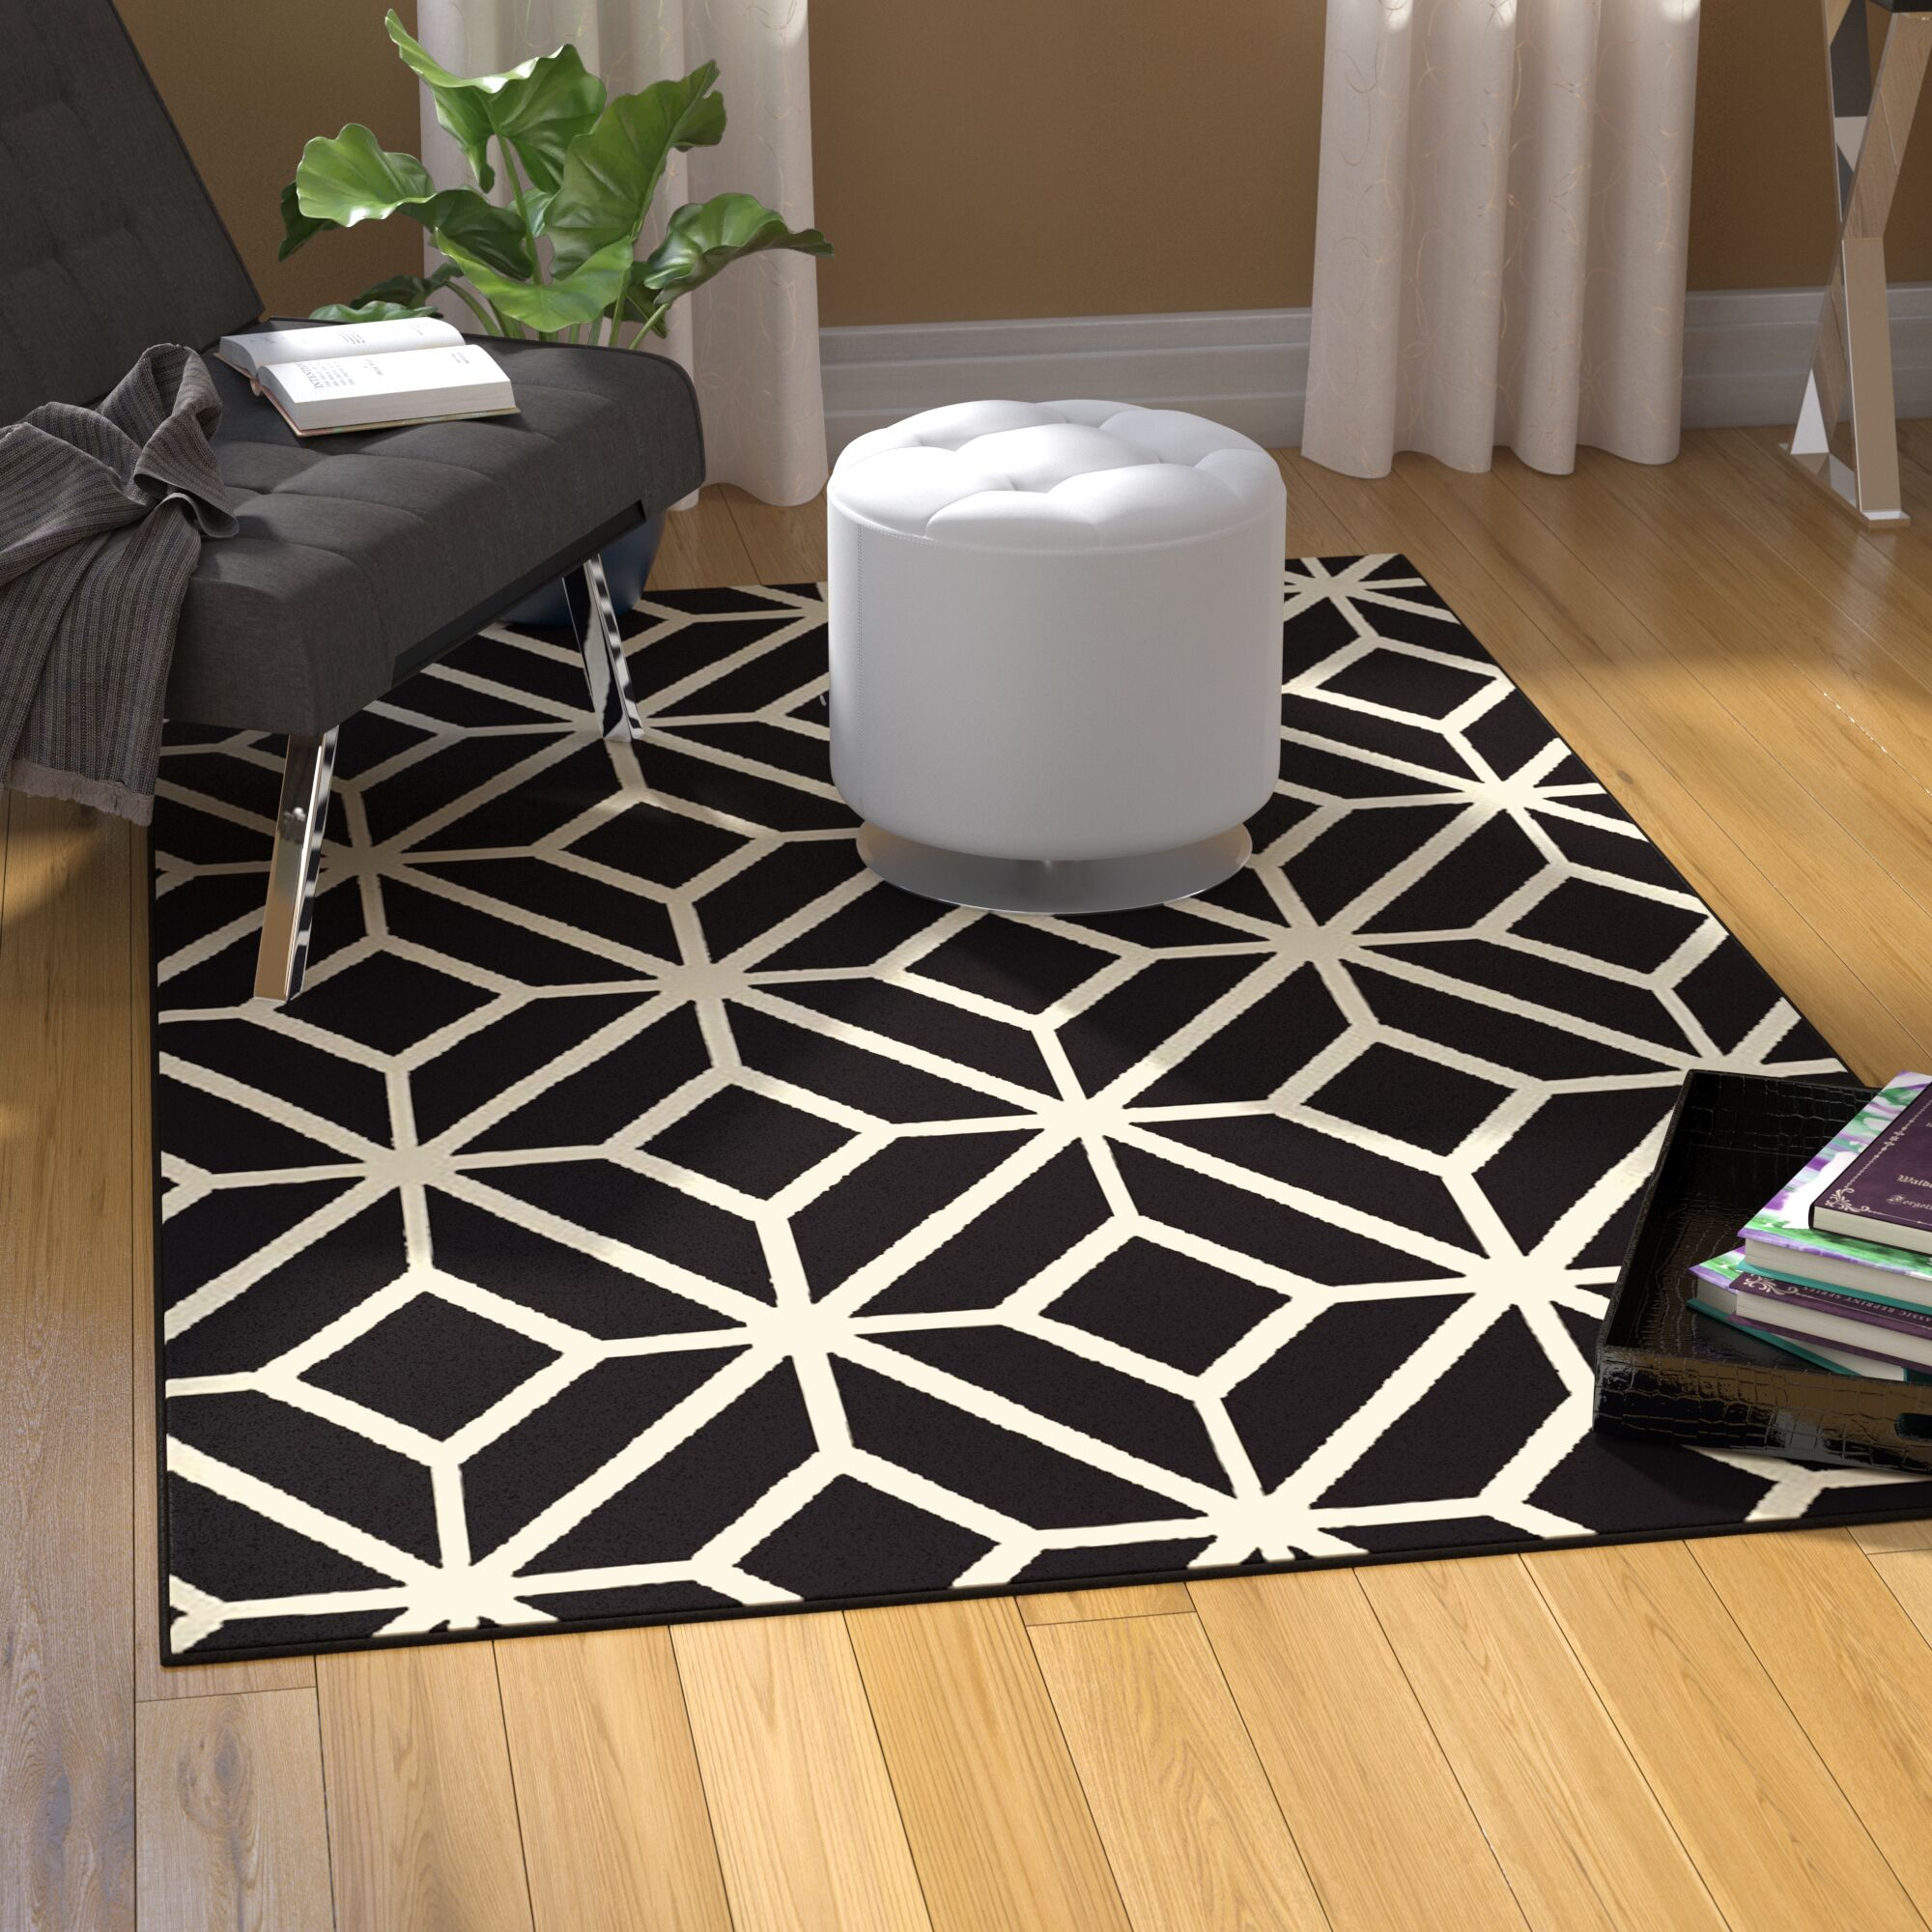 Pleione Black Indoor/Outdoor Area Rug Rug Size: Rectangle 8' x 11'